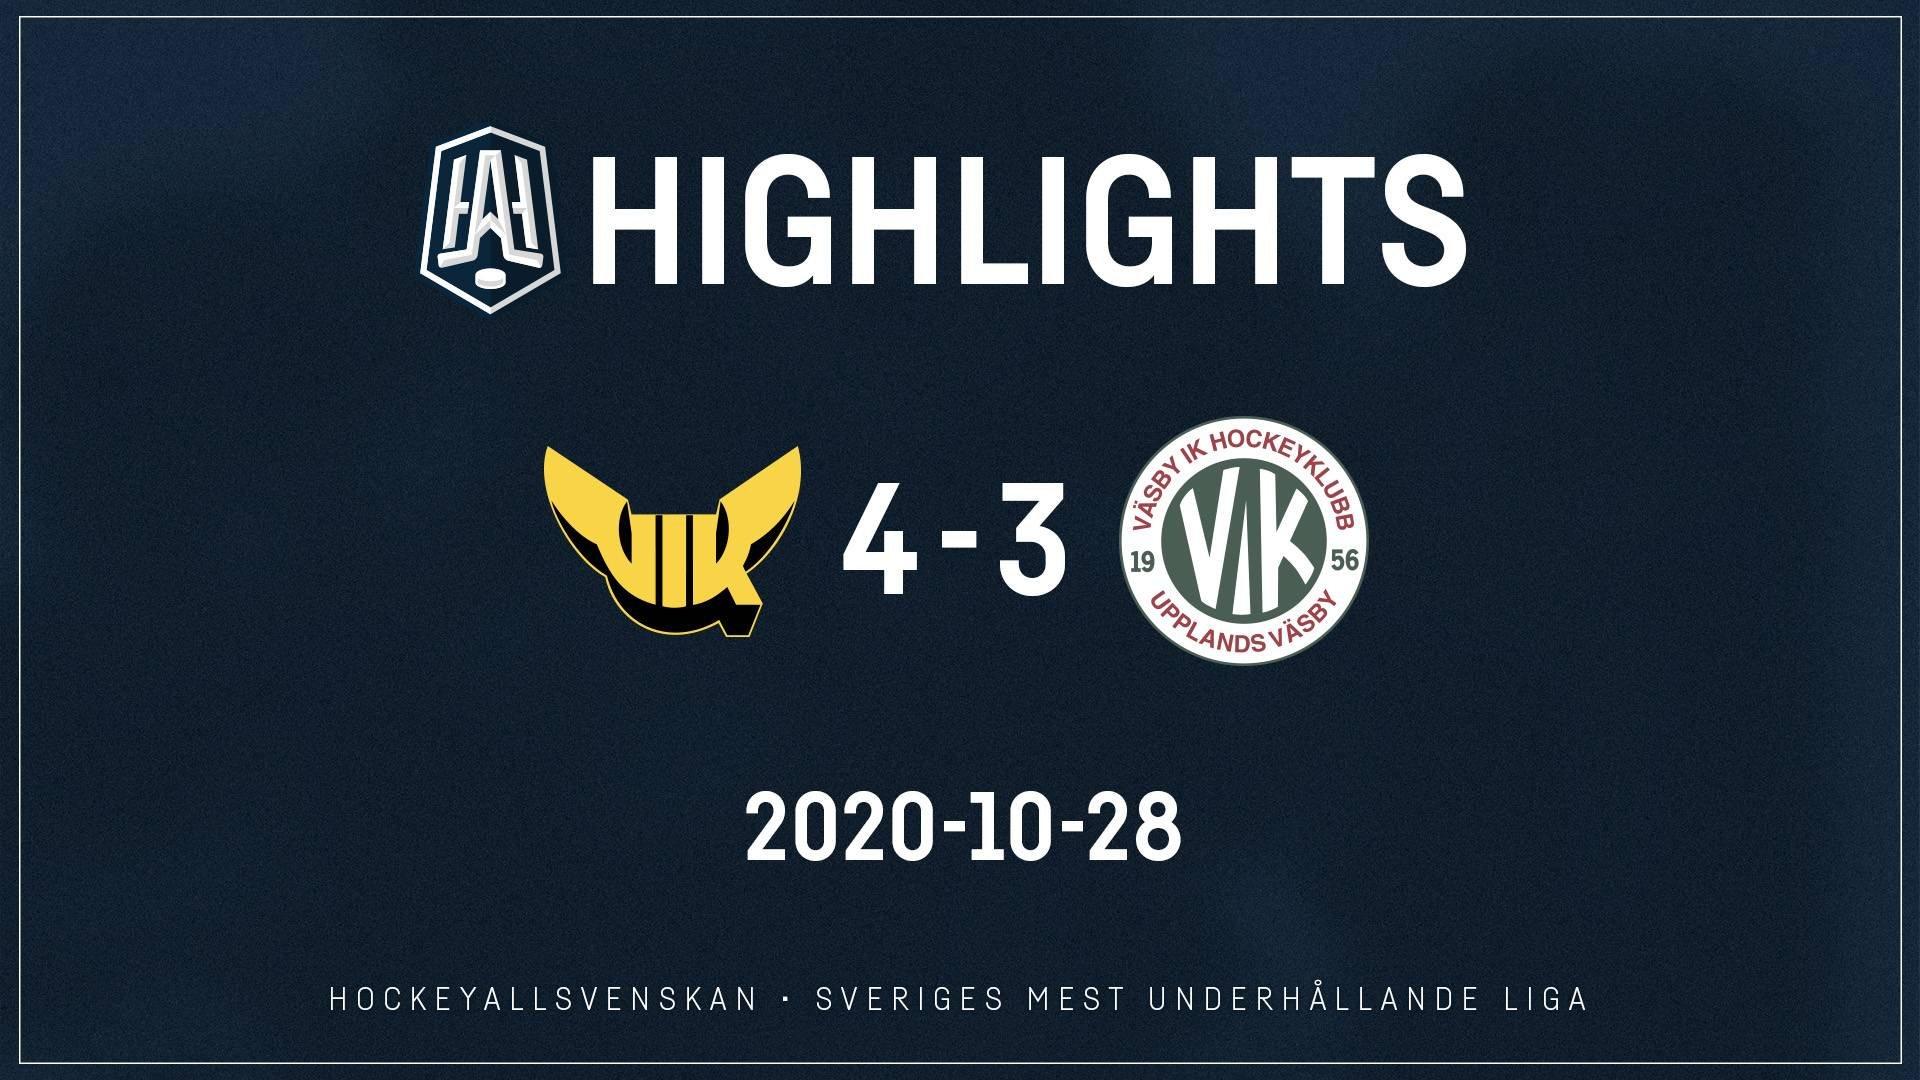 2020-10-28 Västerås - Väsby 4-3